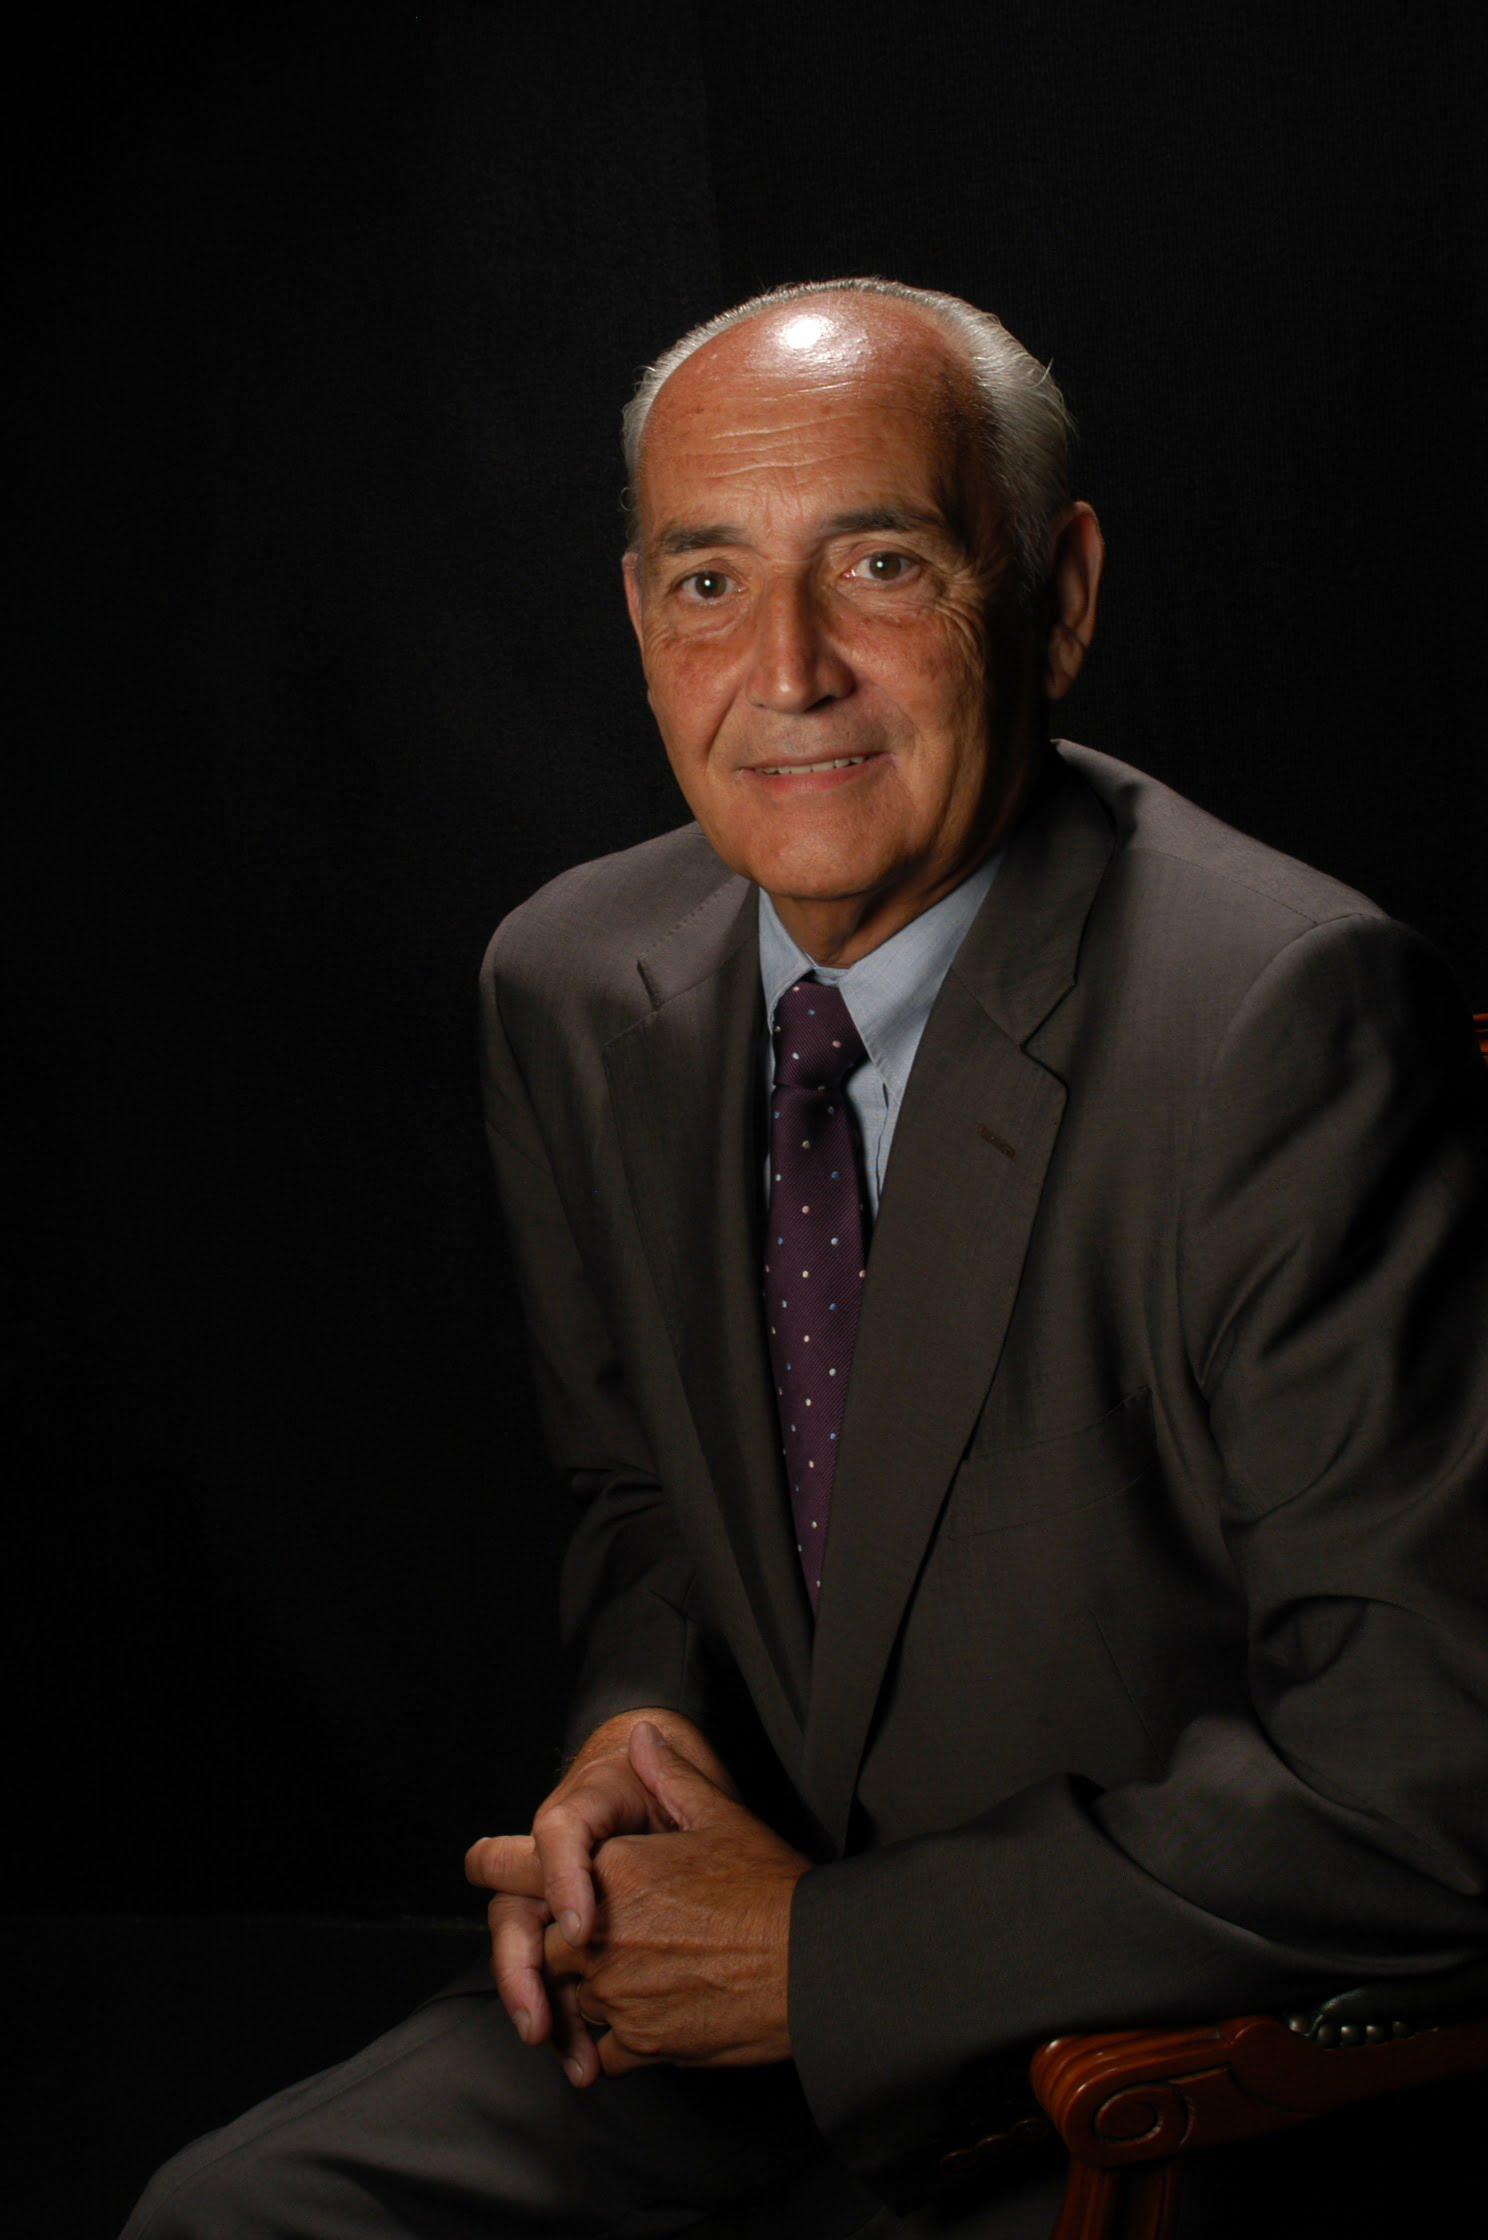 Sr. Àngel Lampreave Caus